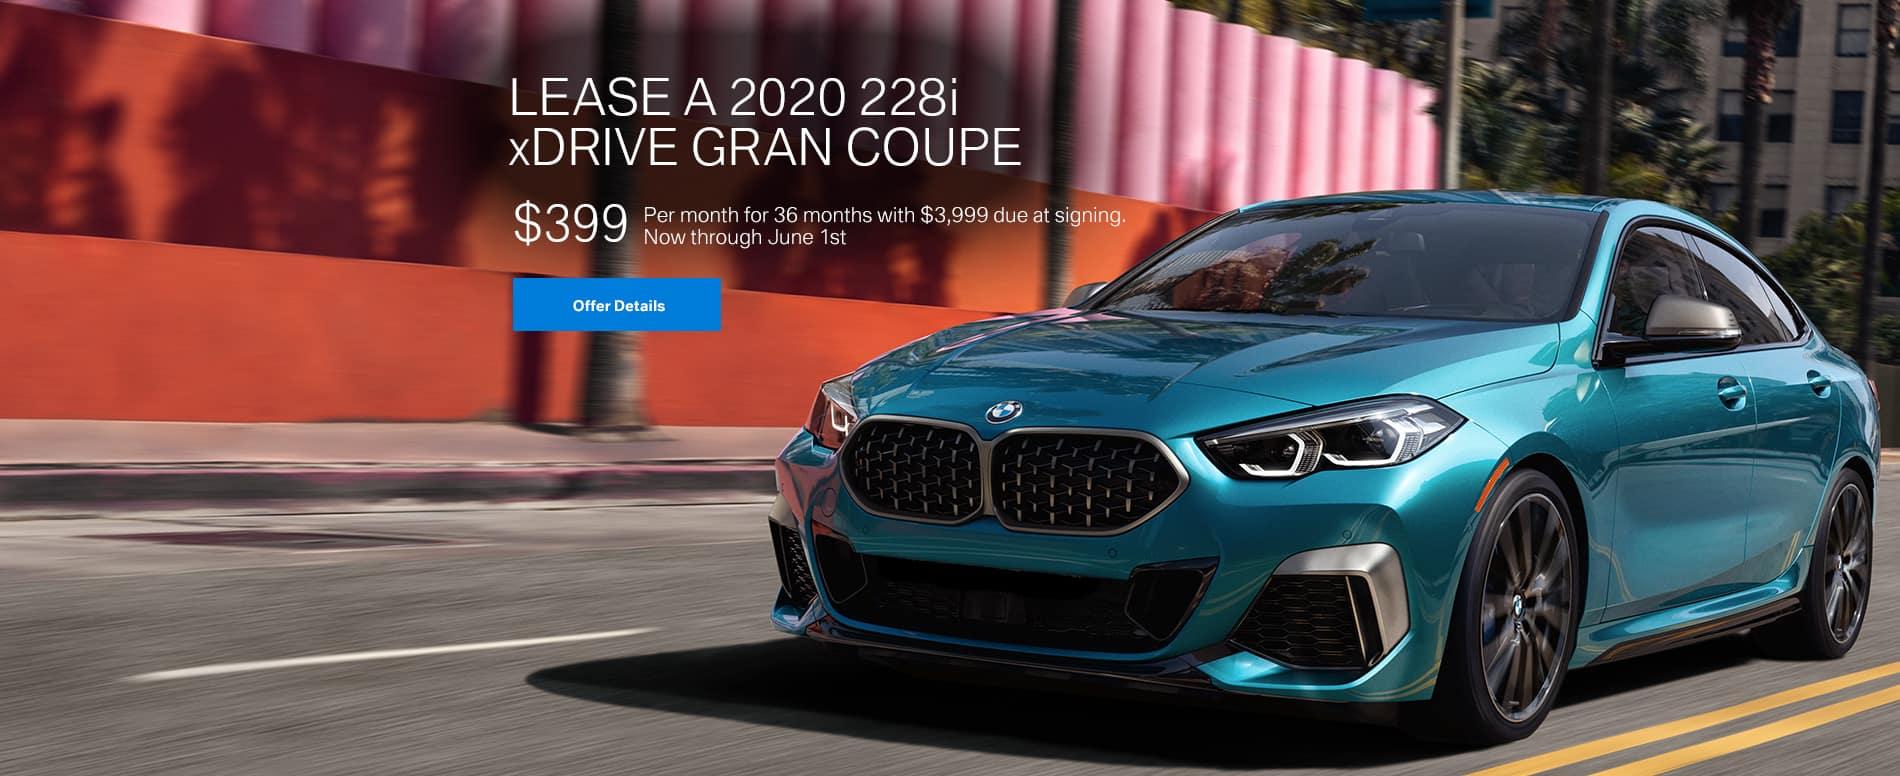 Lease a 2020 228i xDrive Gran Coupe $339/mo.